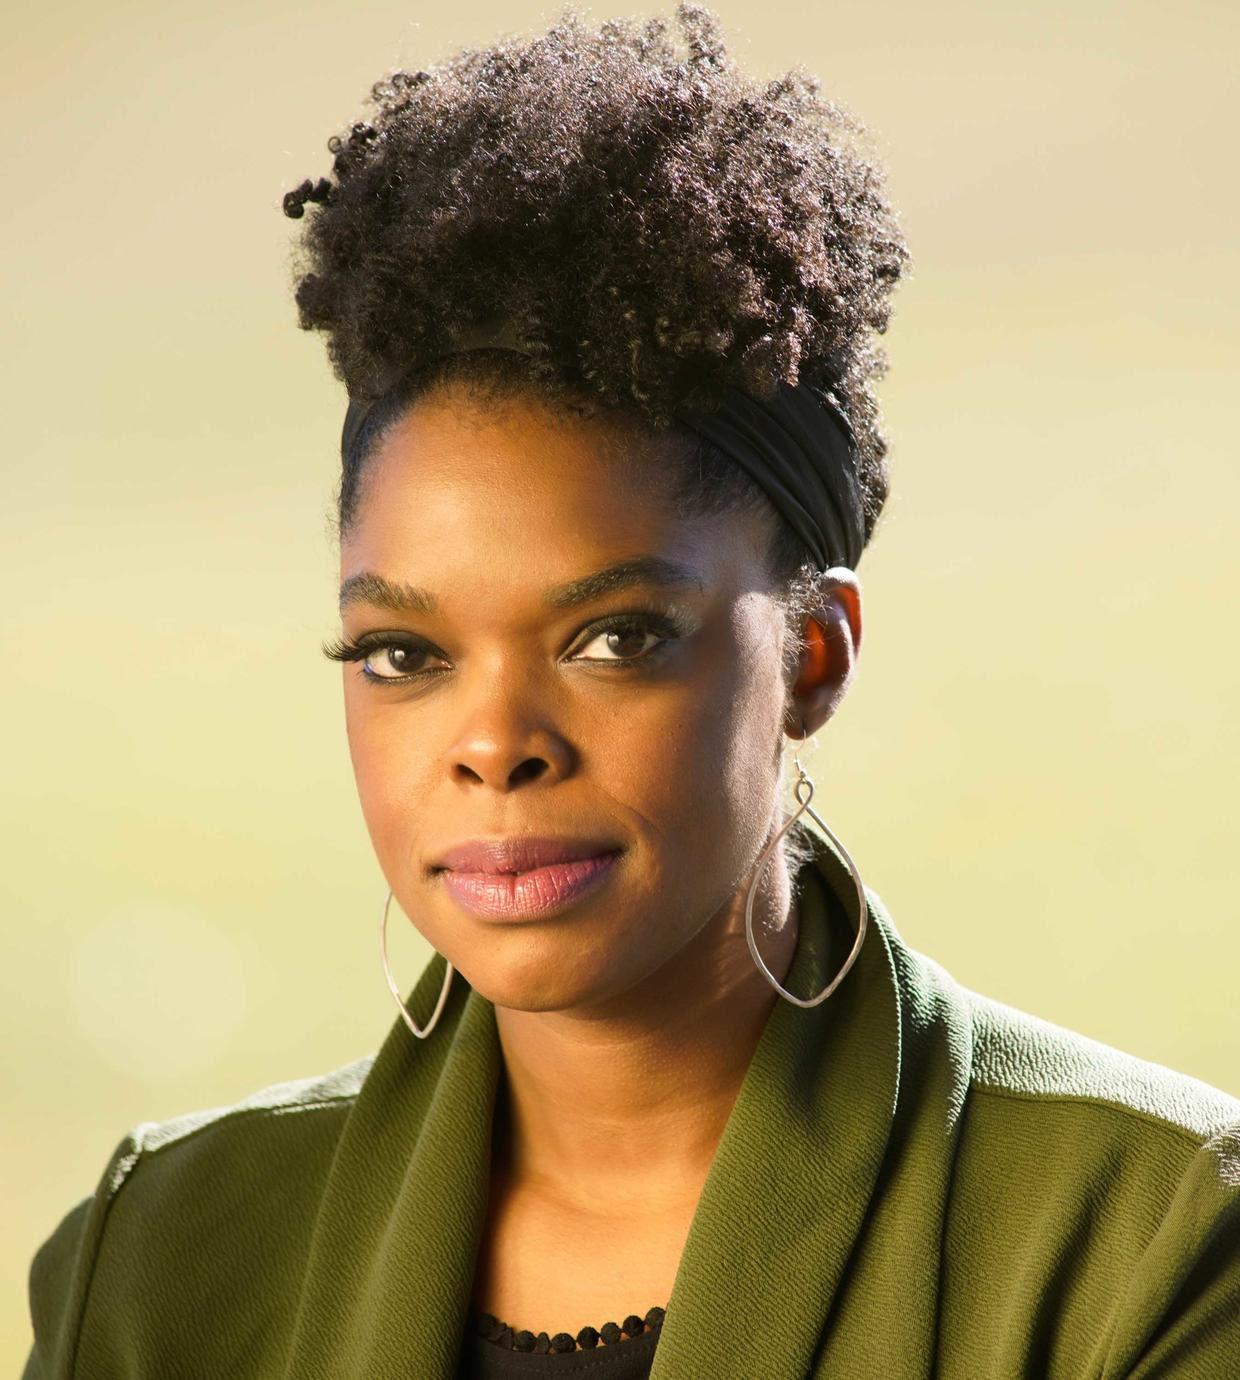 Shawna Thomas, Executive Editor, CBS Mornings University of Southern California